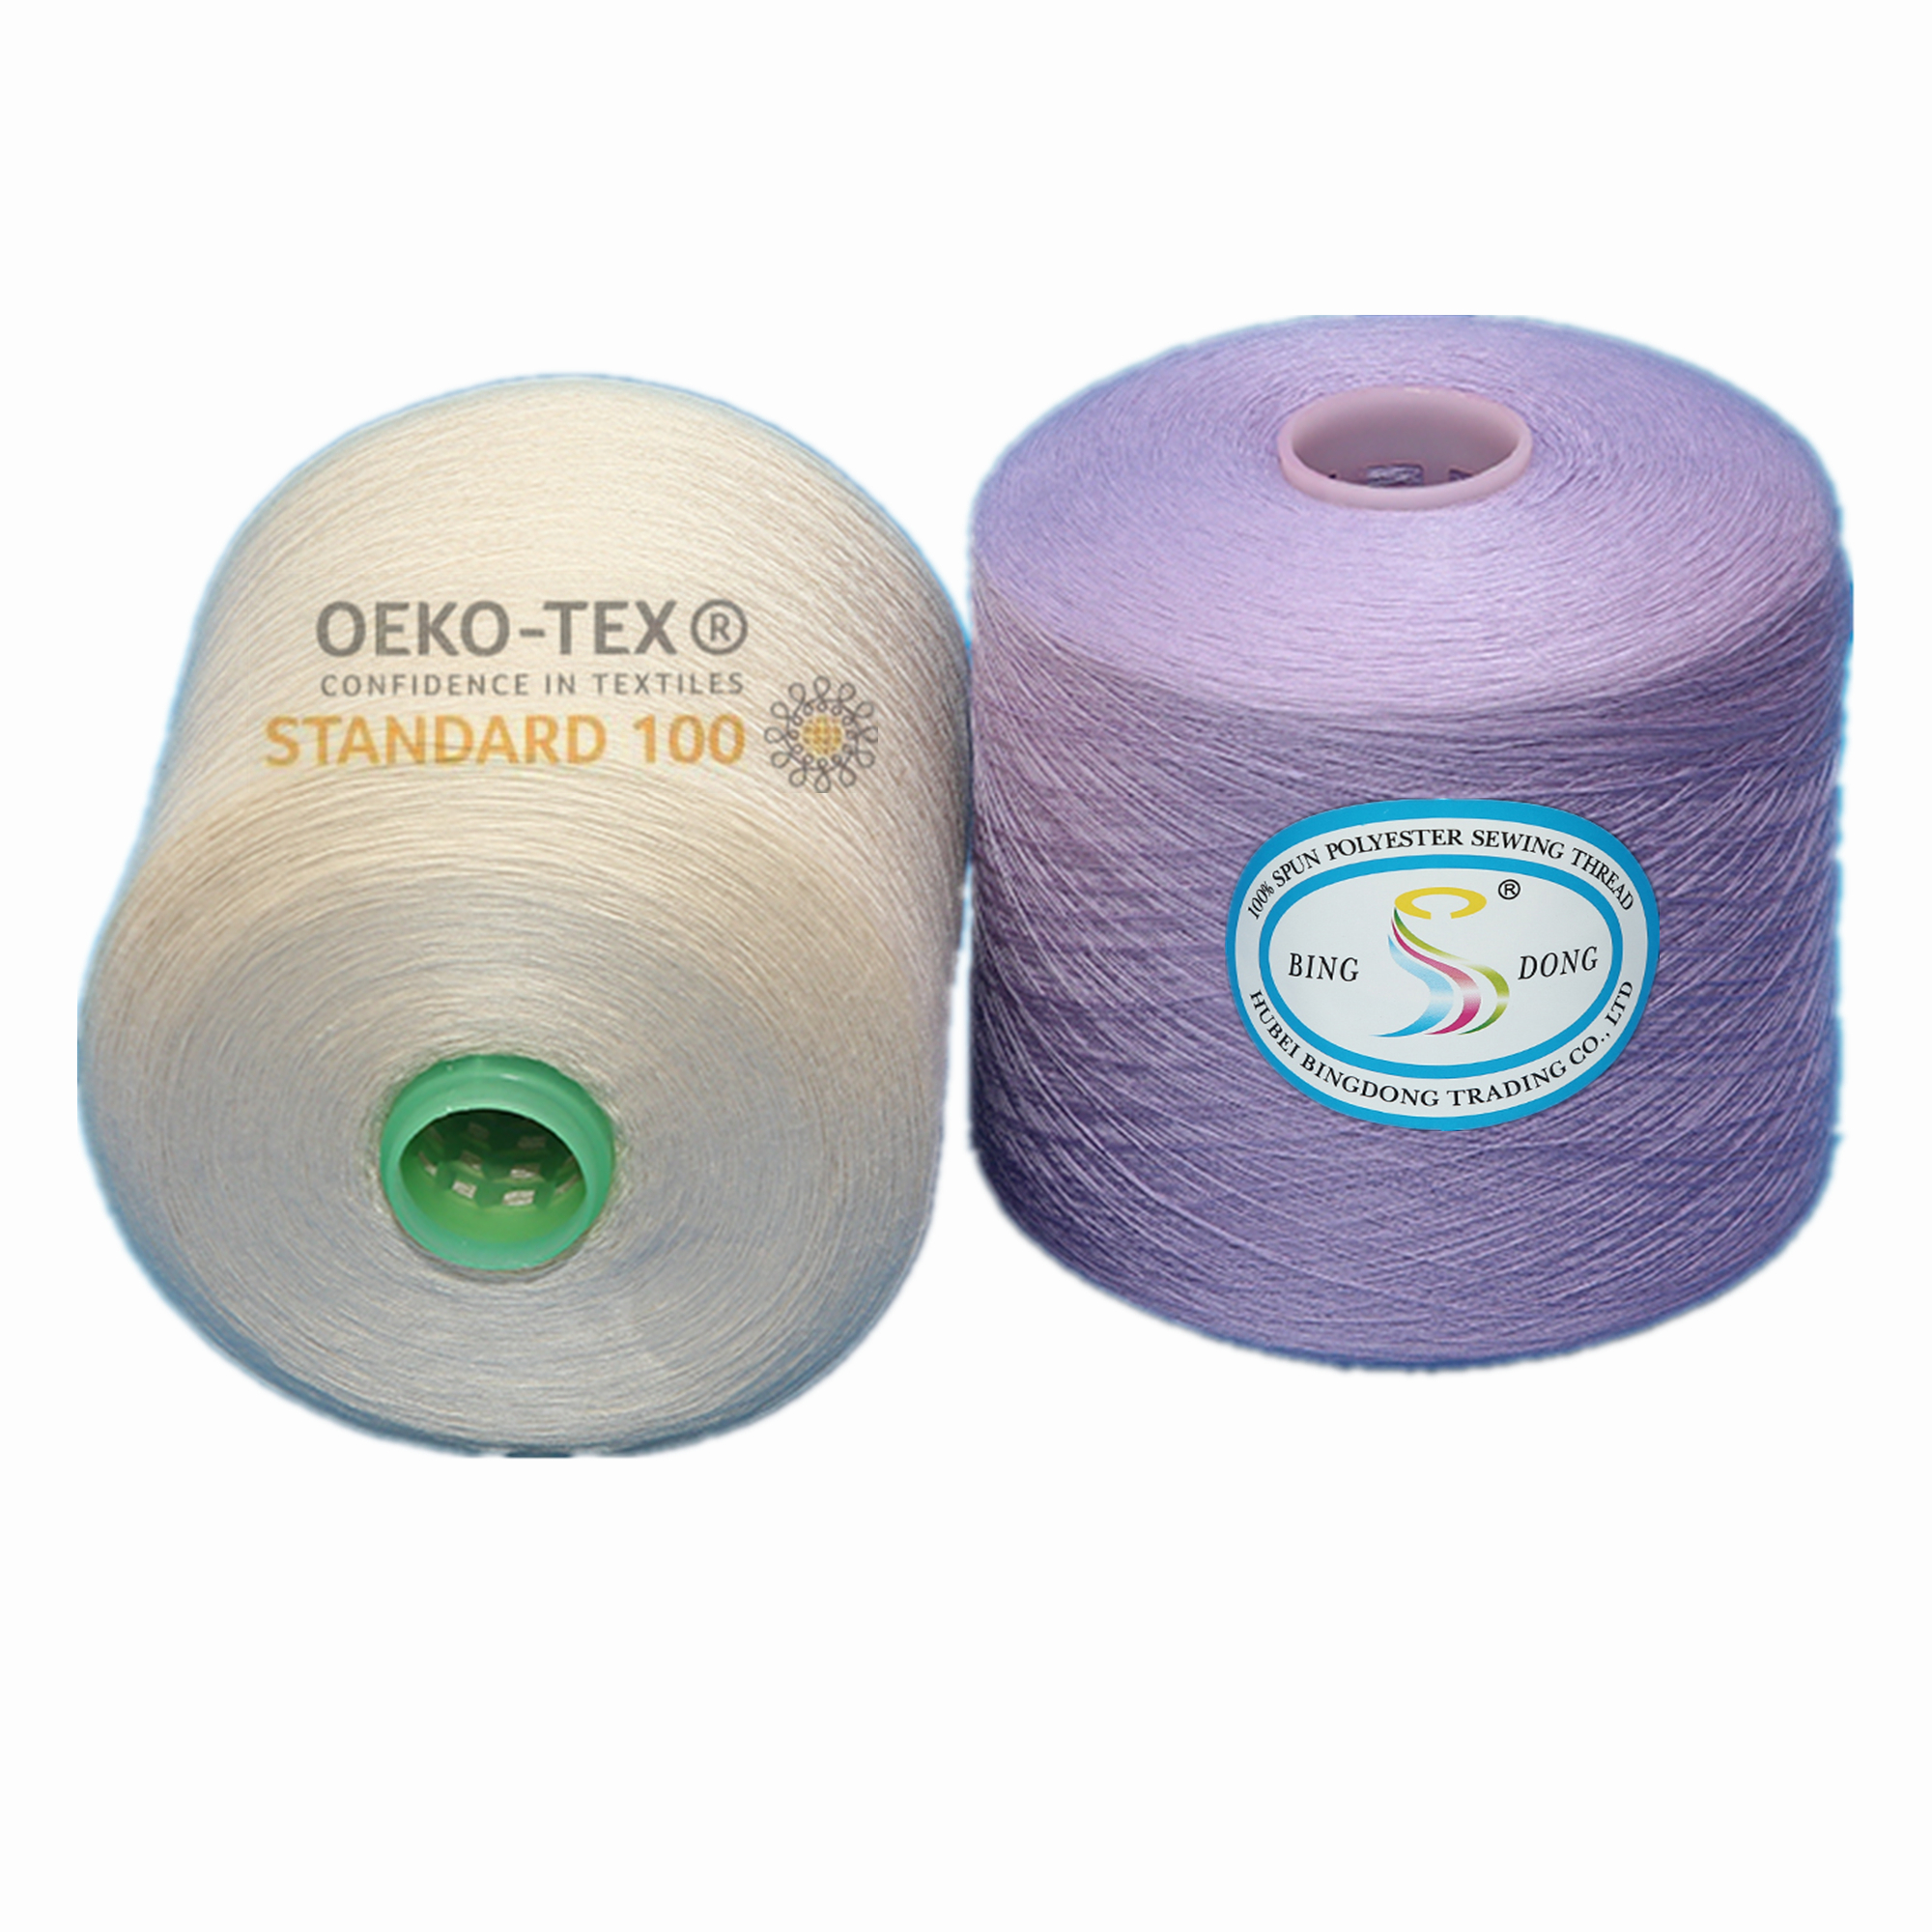 30/3 40/3 50/3 60/3 Recycled polyester spun yarn close virgin yarn eco friendly yarn 20S/3